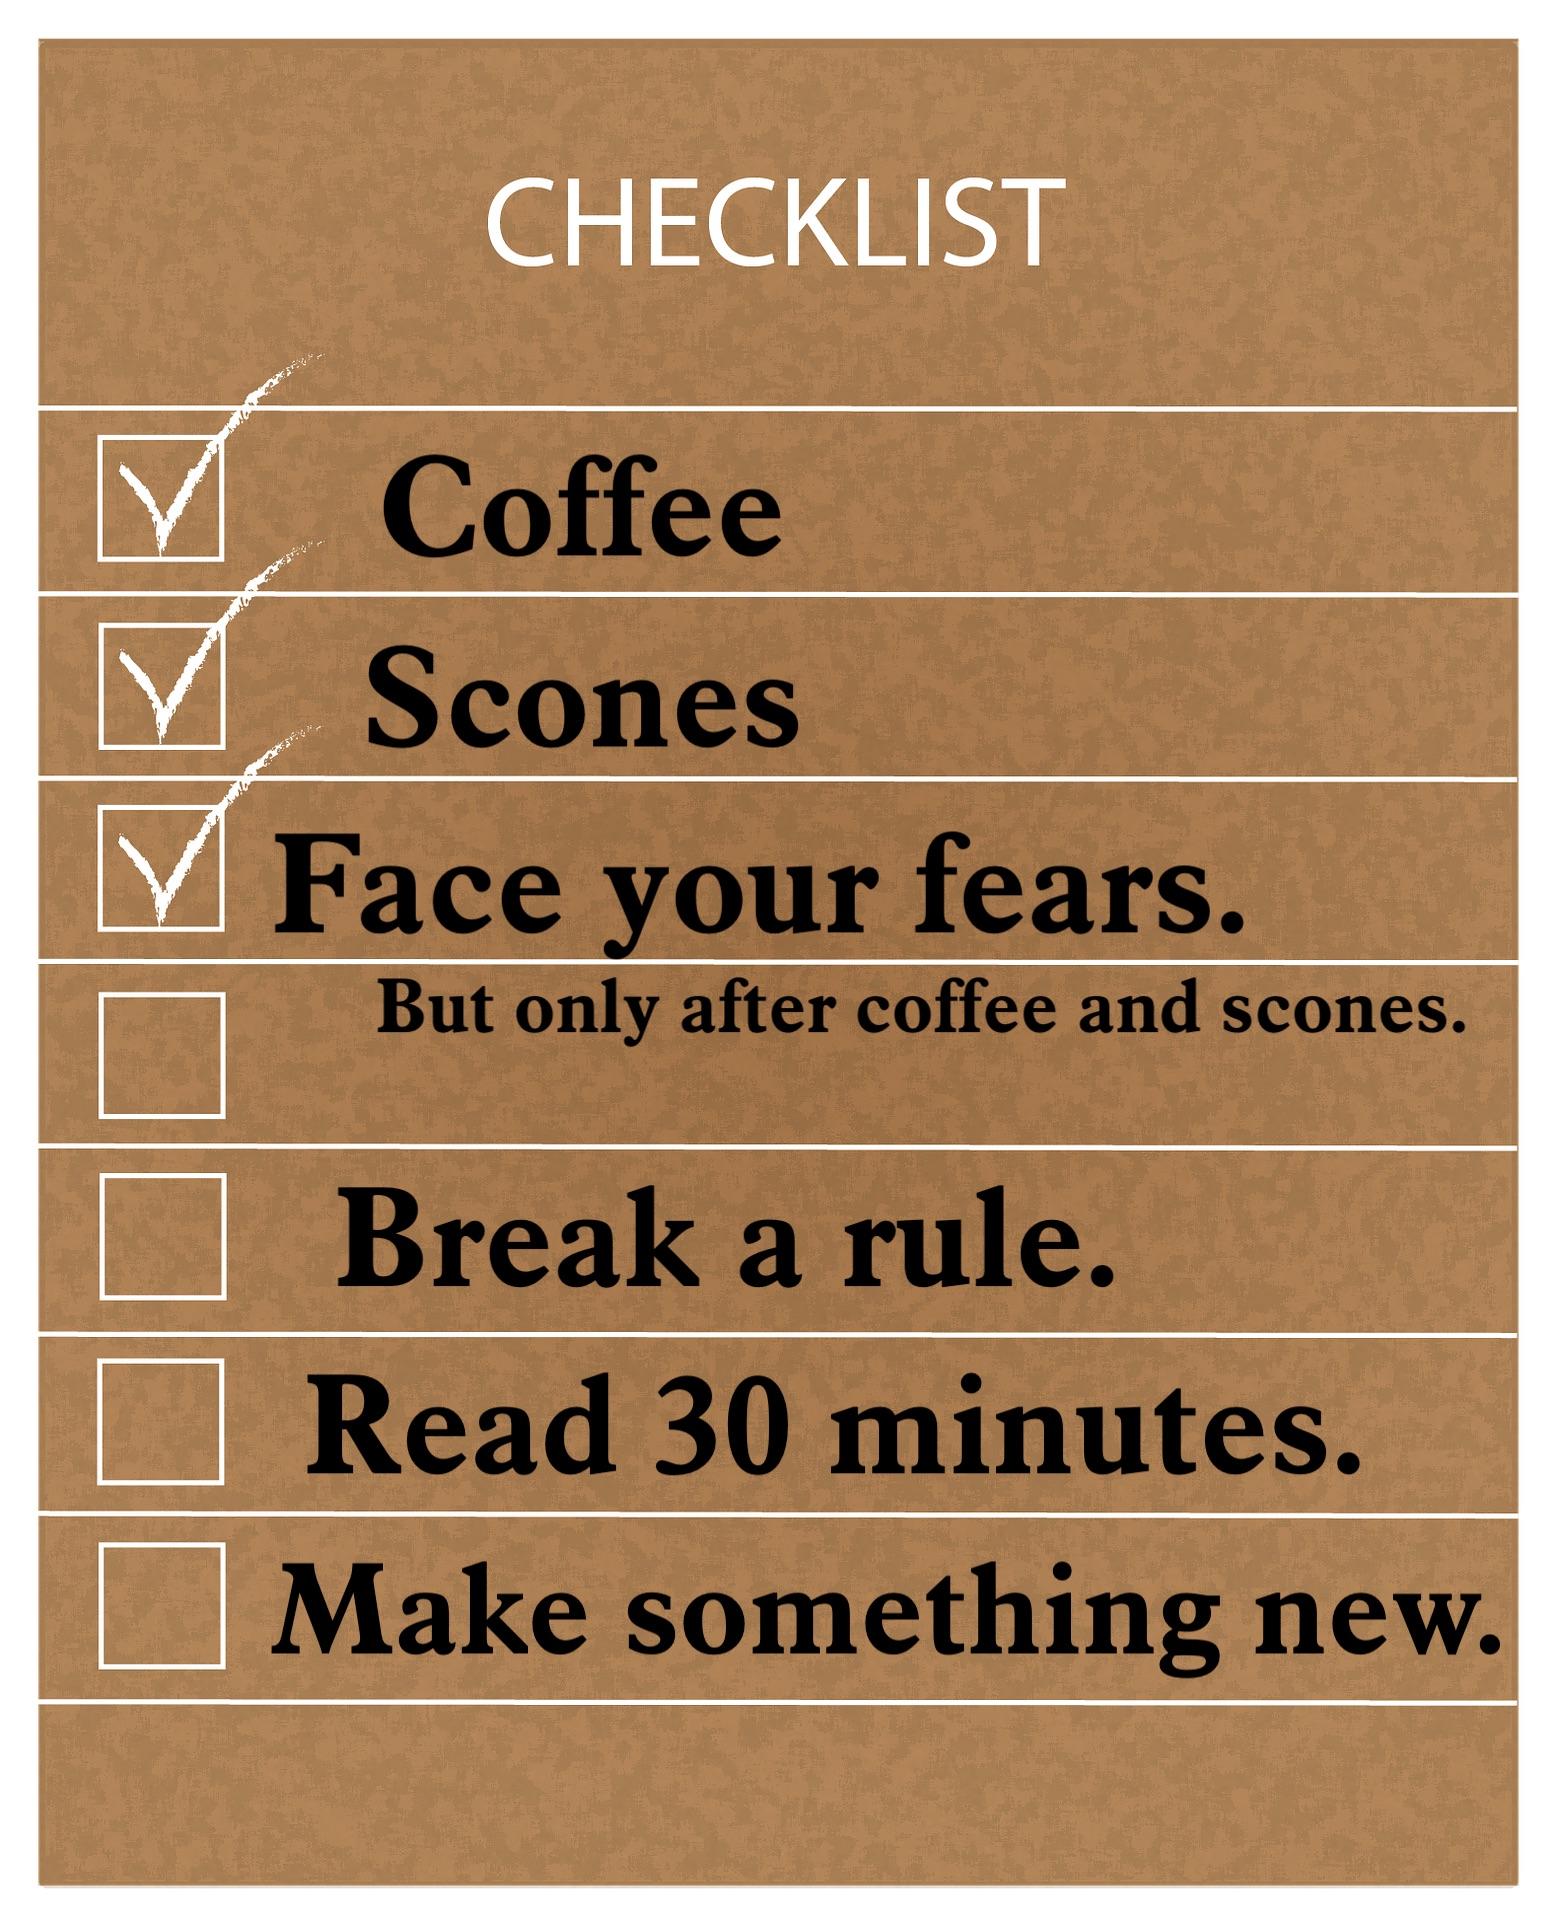 checklist-3 with items jpg